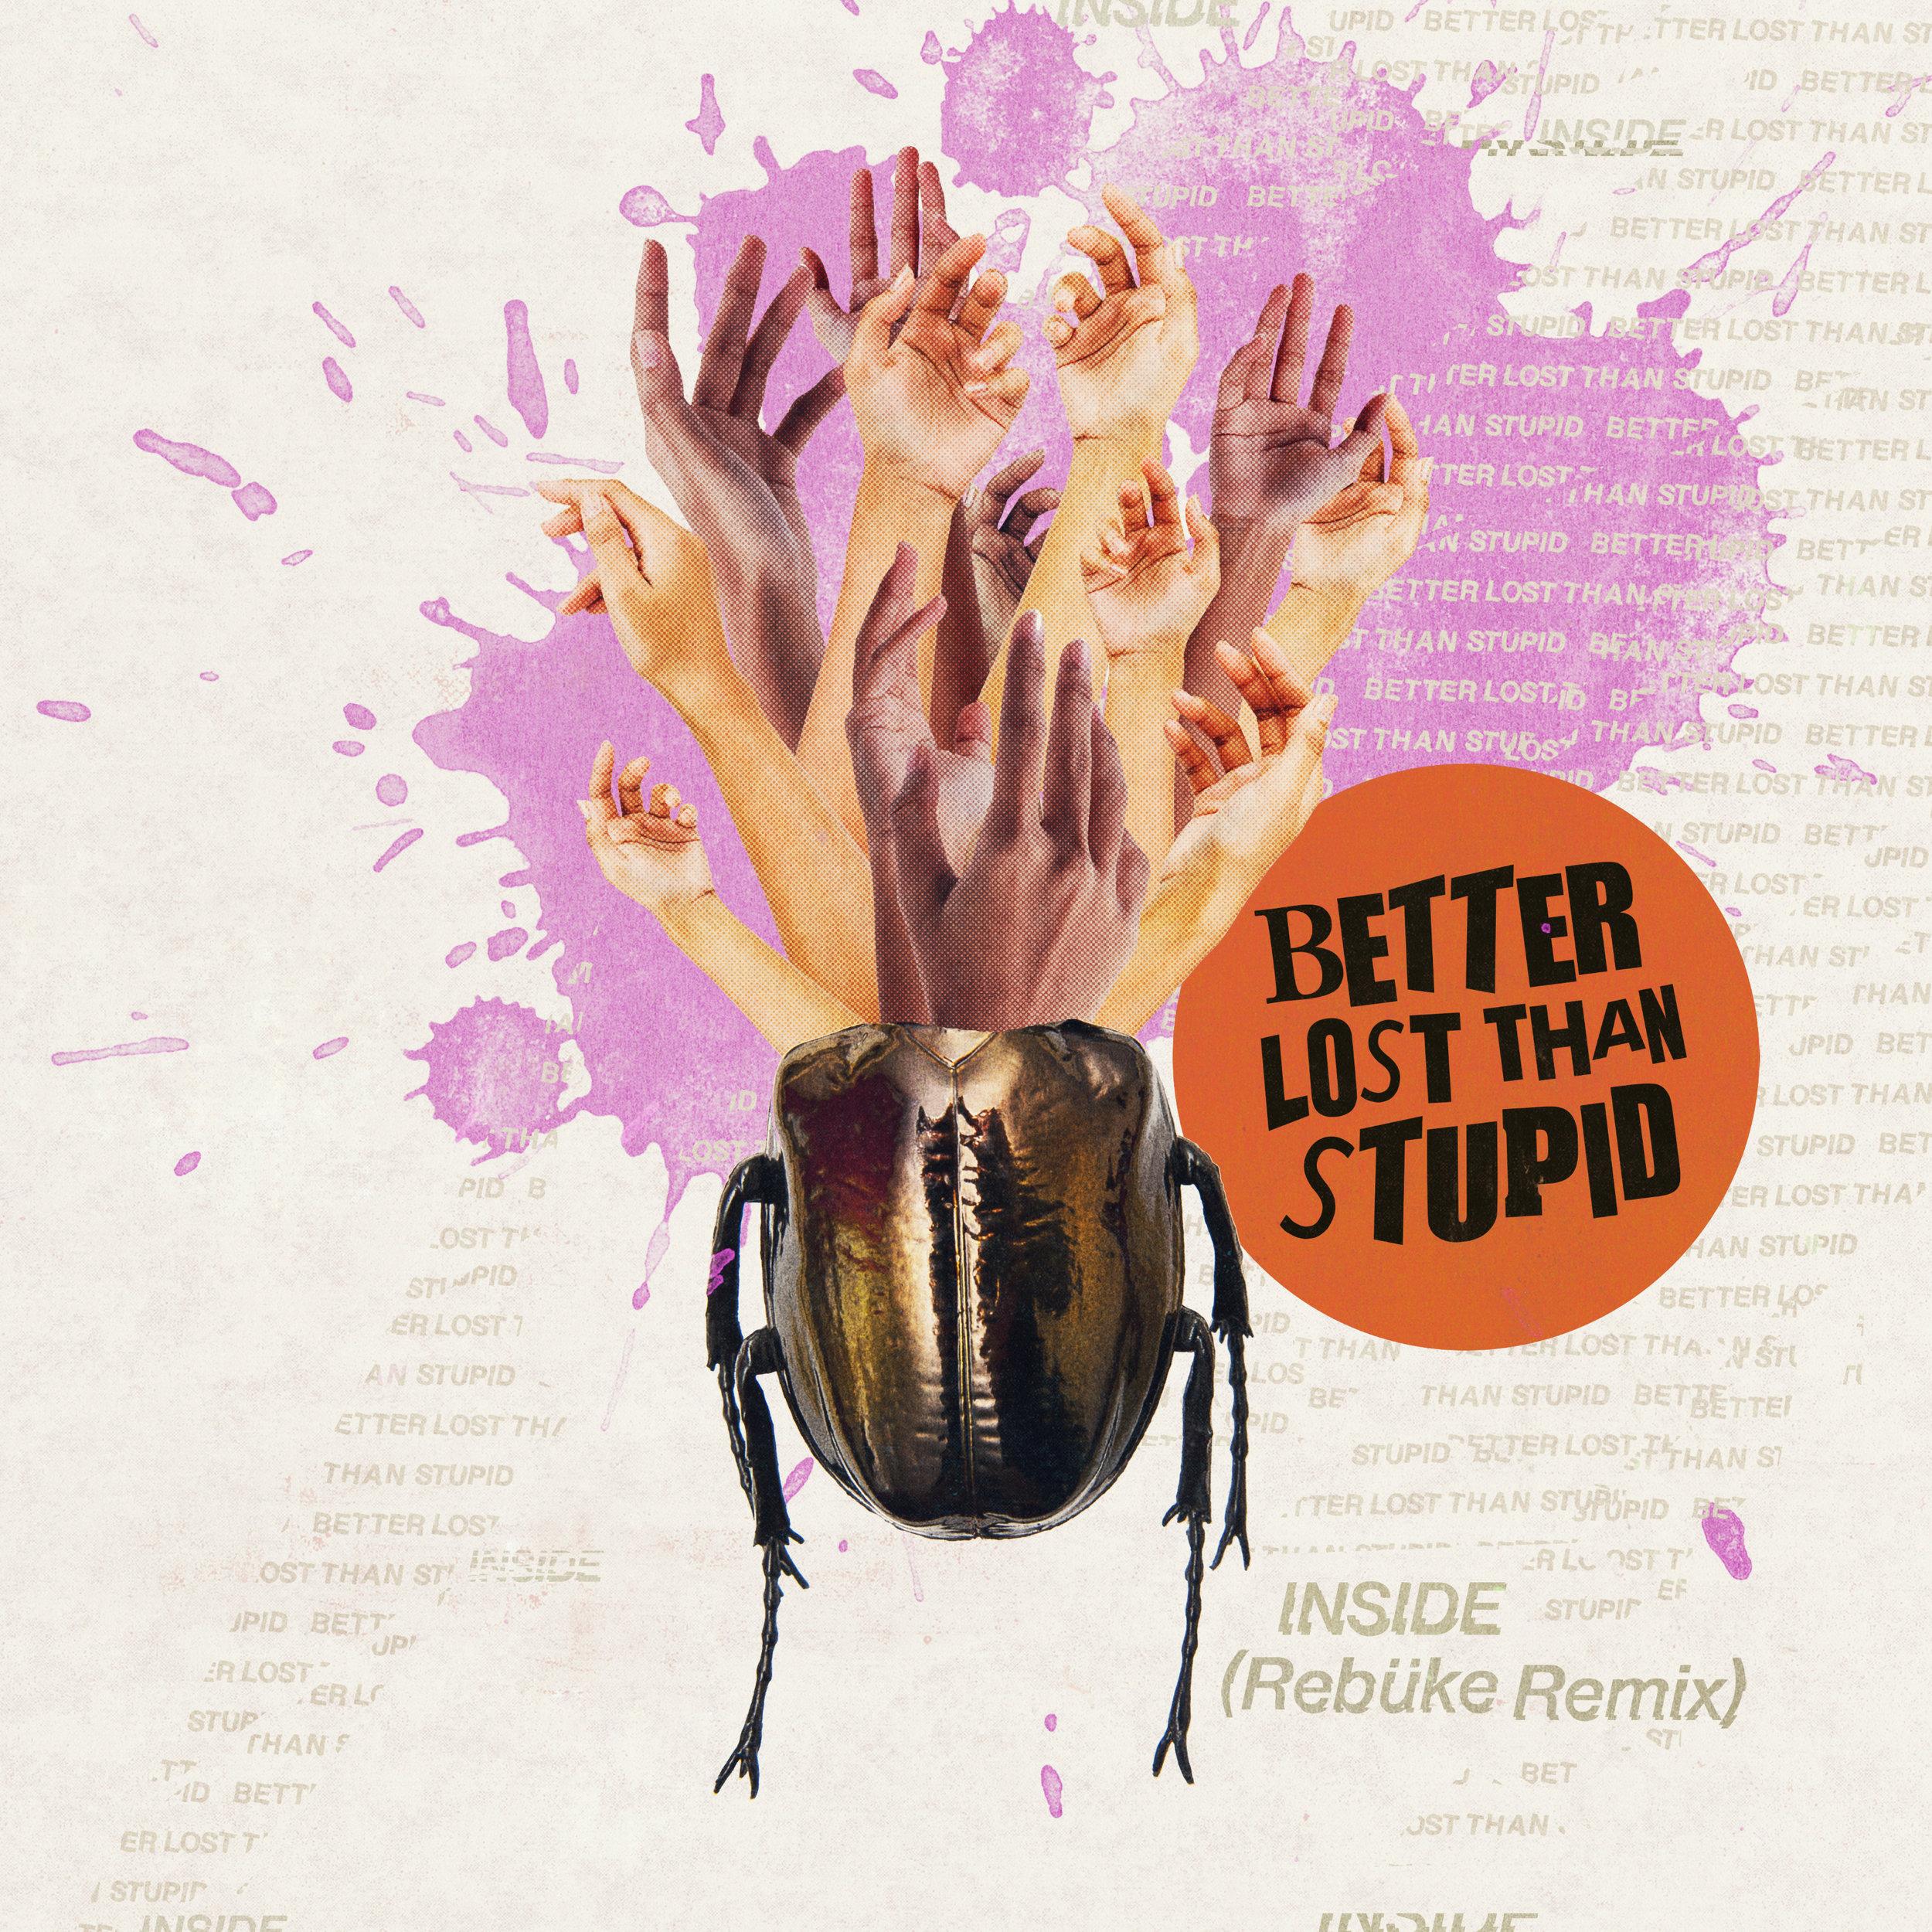 BetterLost_Inside_Remix.jpg